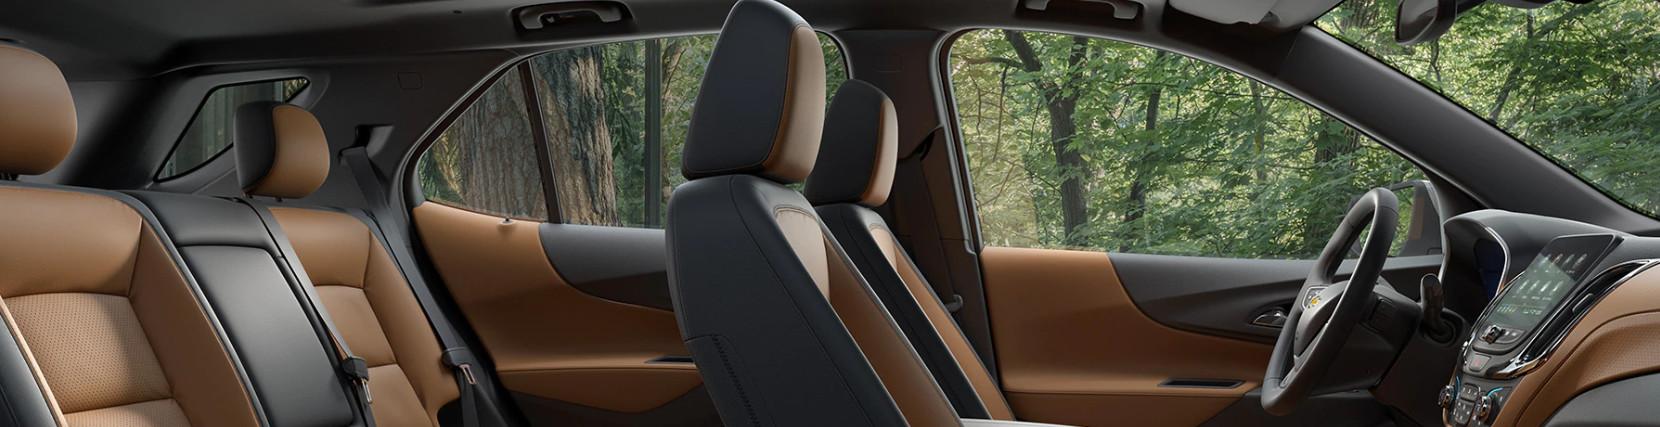 Interior of the 2020 Chevrolet Equinox